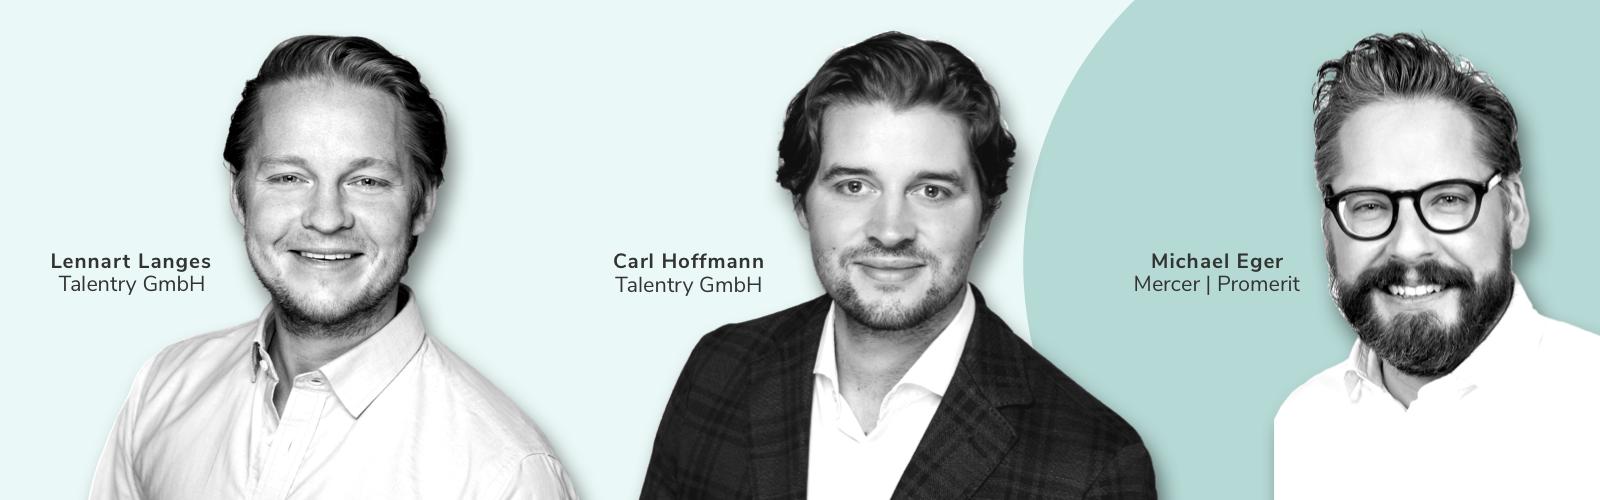 Talentry Partner Webinar Zukunft Personal Internal Mobility Mercer Promerit